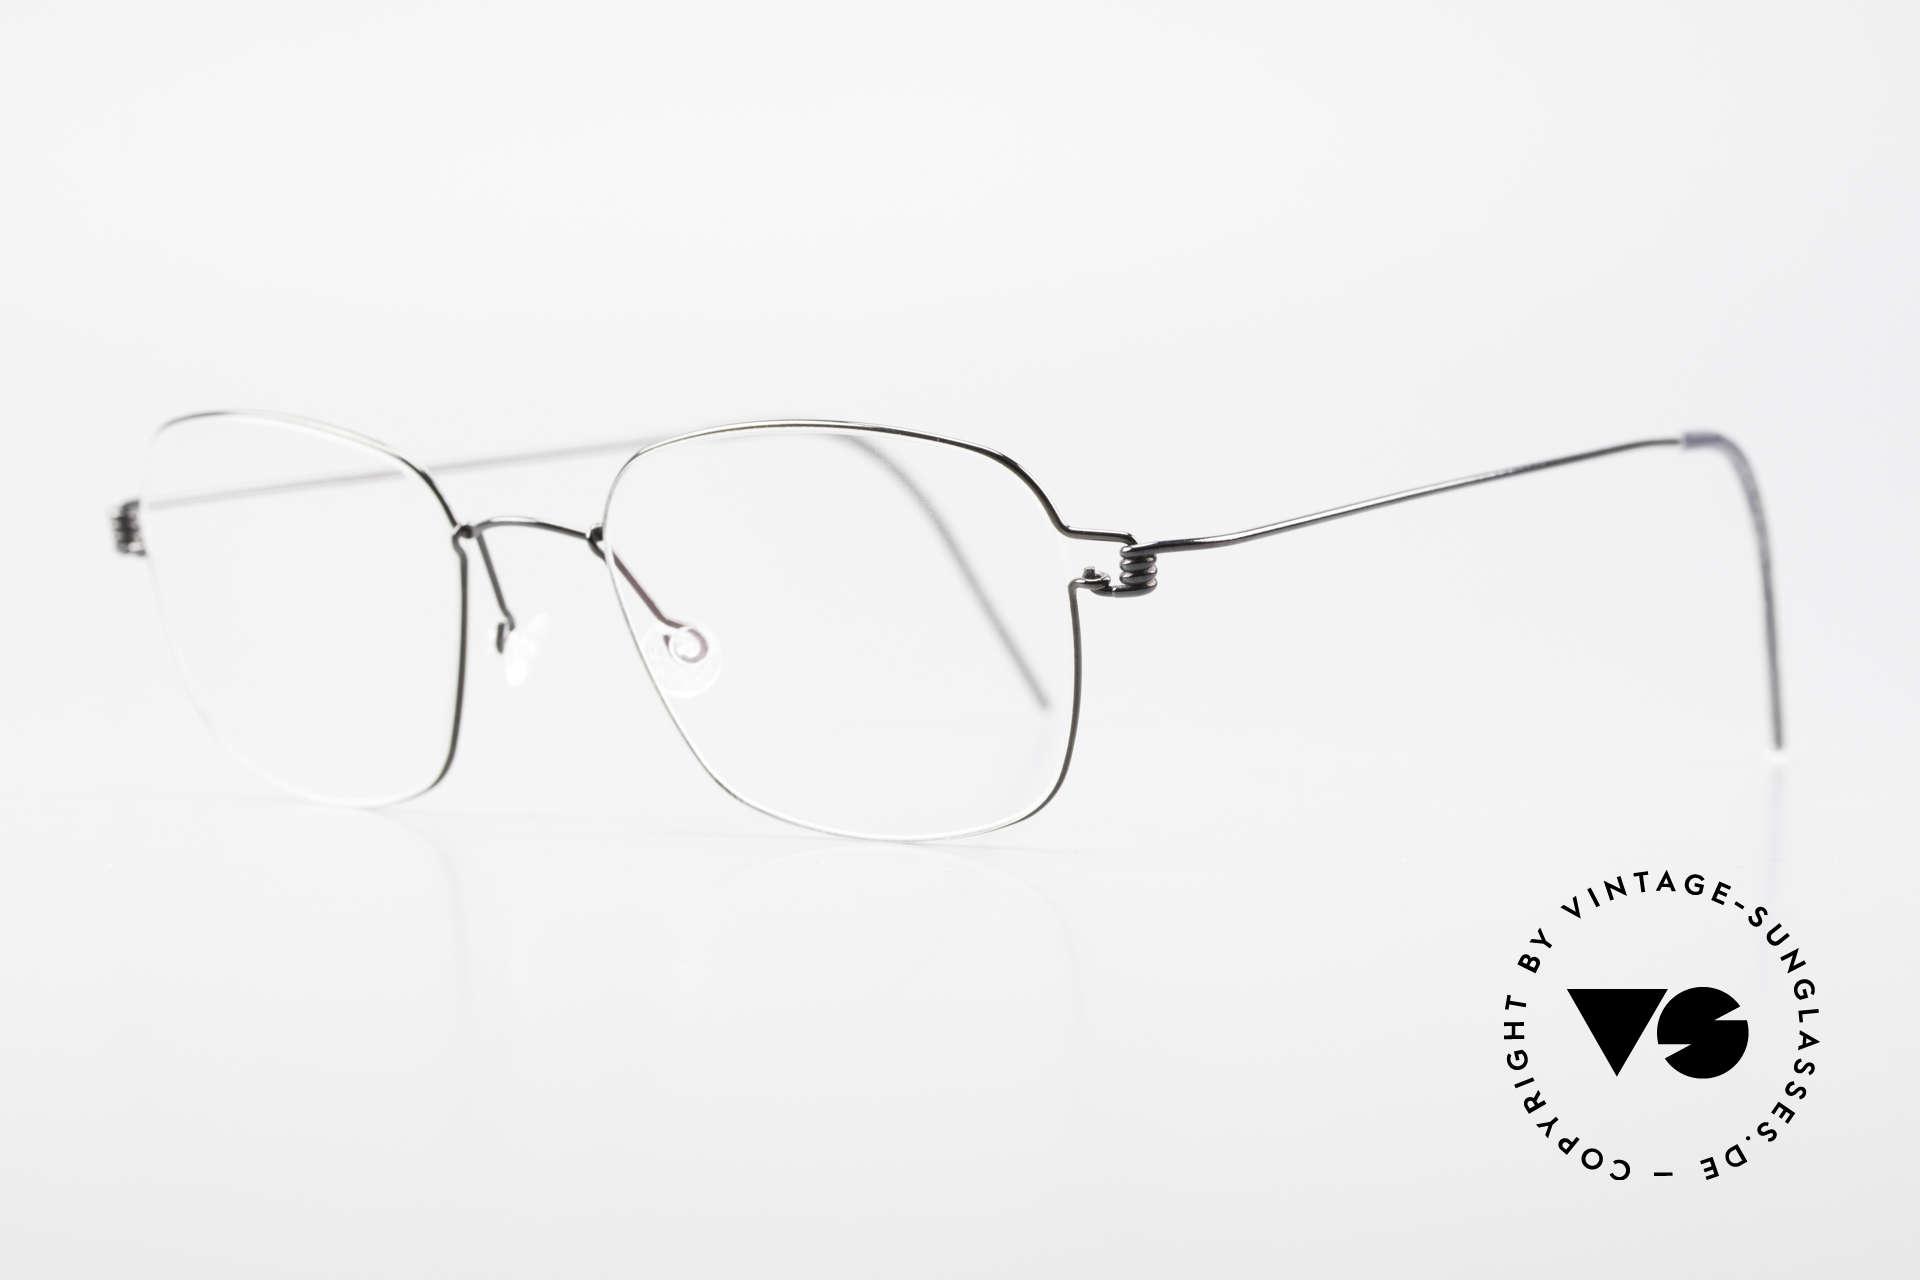 Lindberg Santi Air Titan Rim Classic Titanium Frame Men, simply timeless, stylish & innovative: grade 'vintage', Made for Men